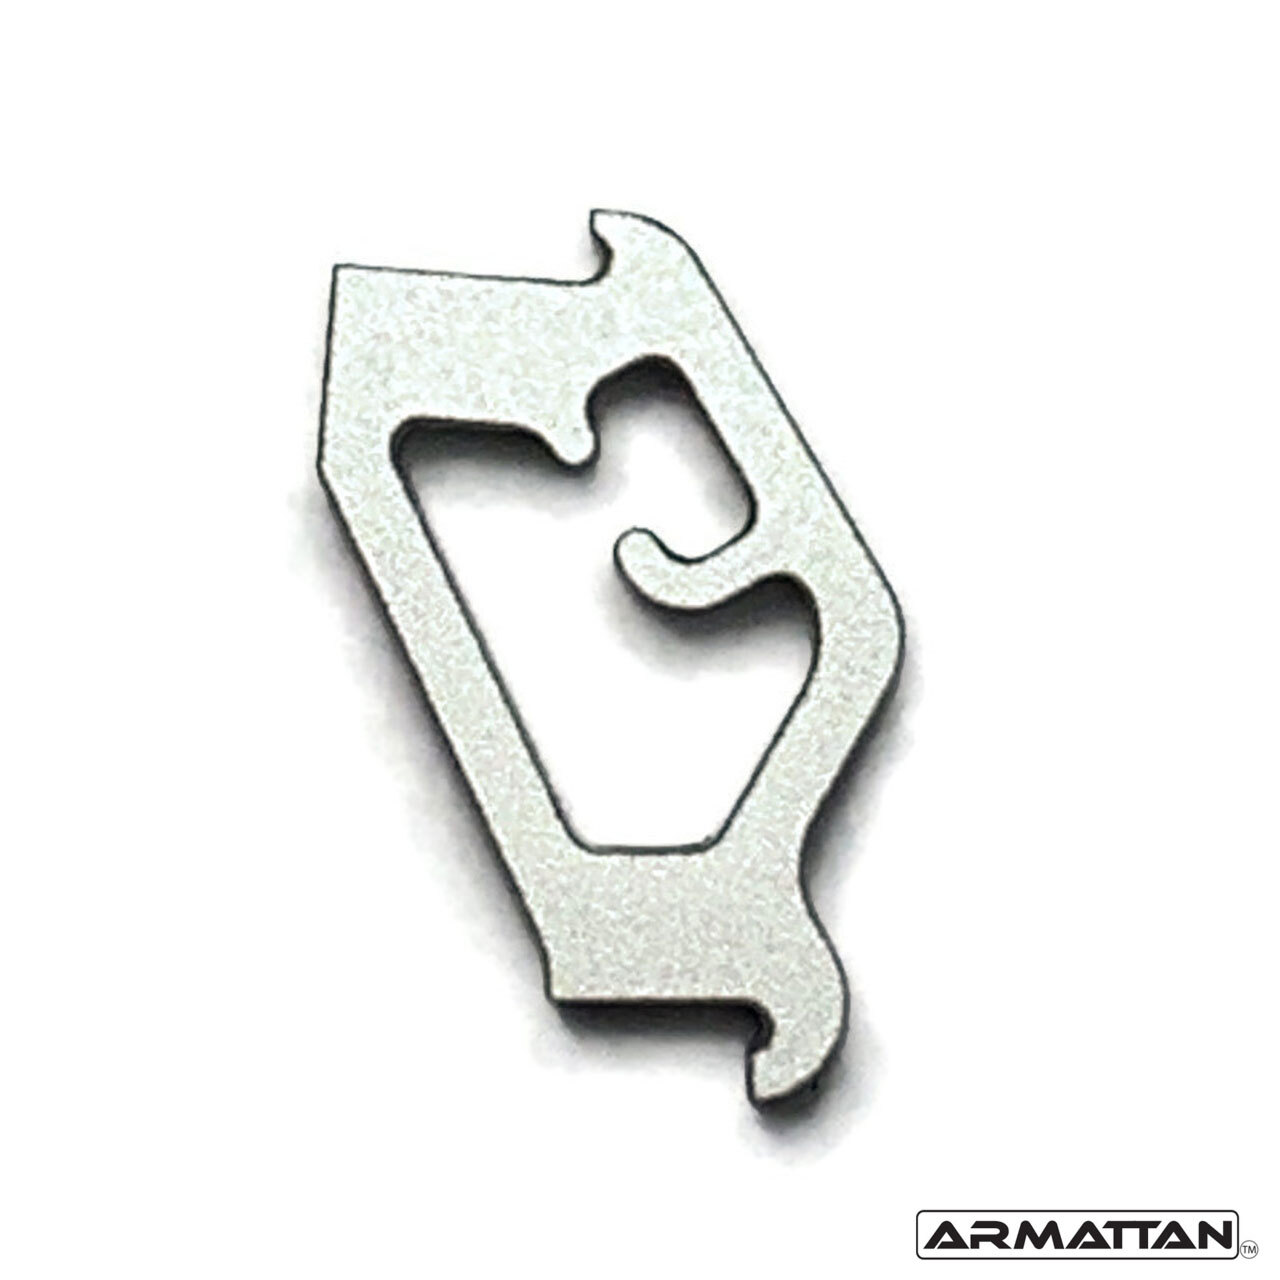 Armattan Tadpole Aluminum Tail Post